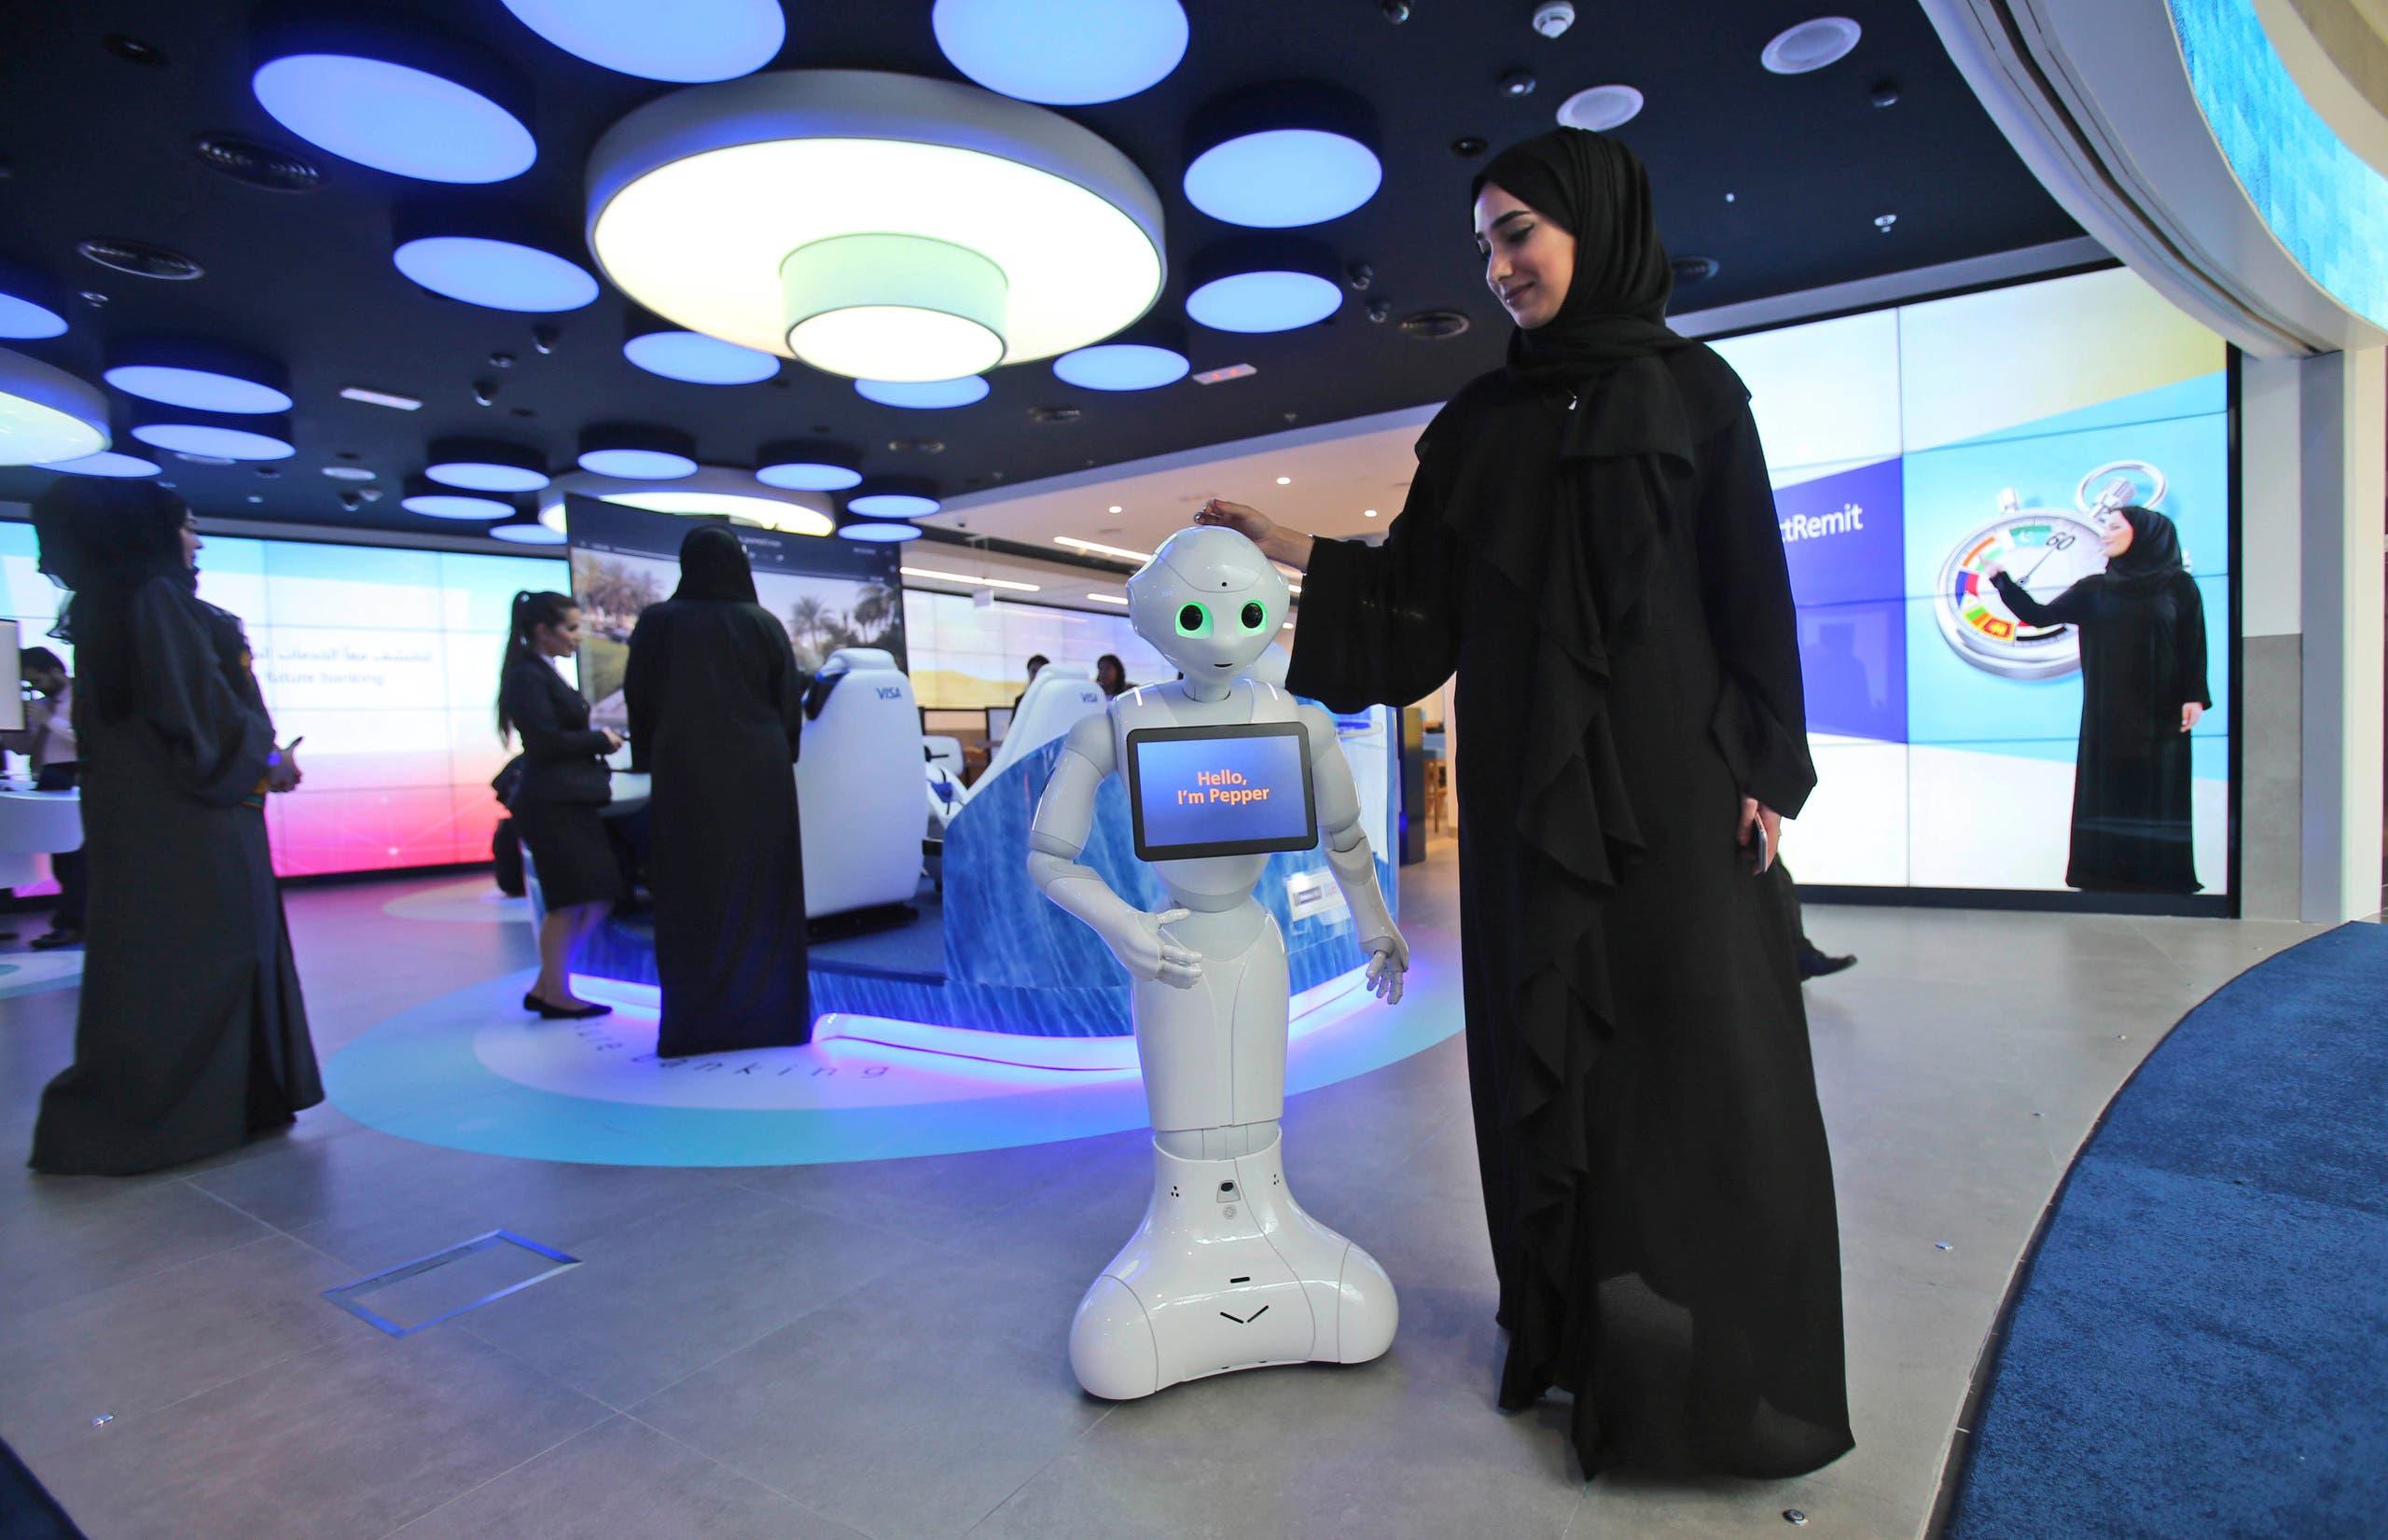 An Emirati woman presents Pepper, a robot, at a bank, as a part of the Dubai Future Accelerators in Dubai, UAE, on Oct. 4, 2016. (AP)